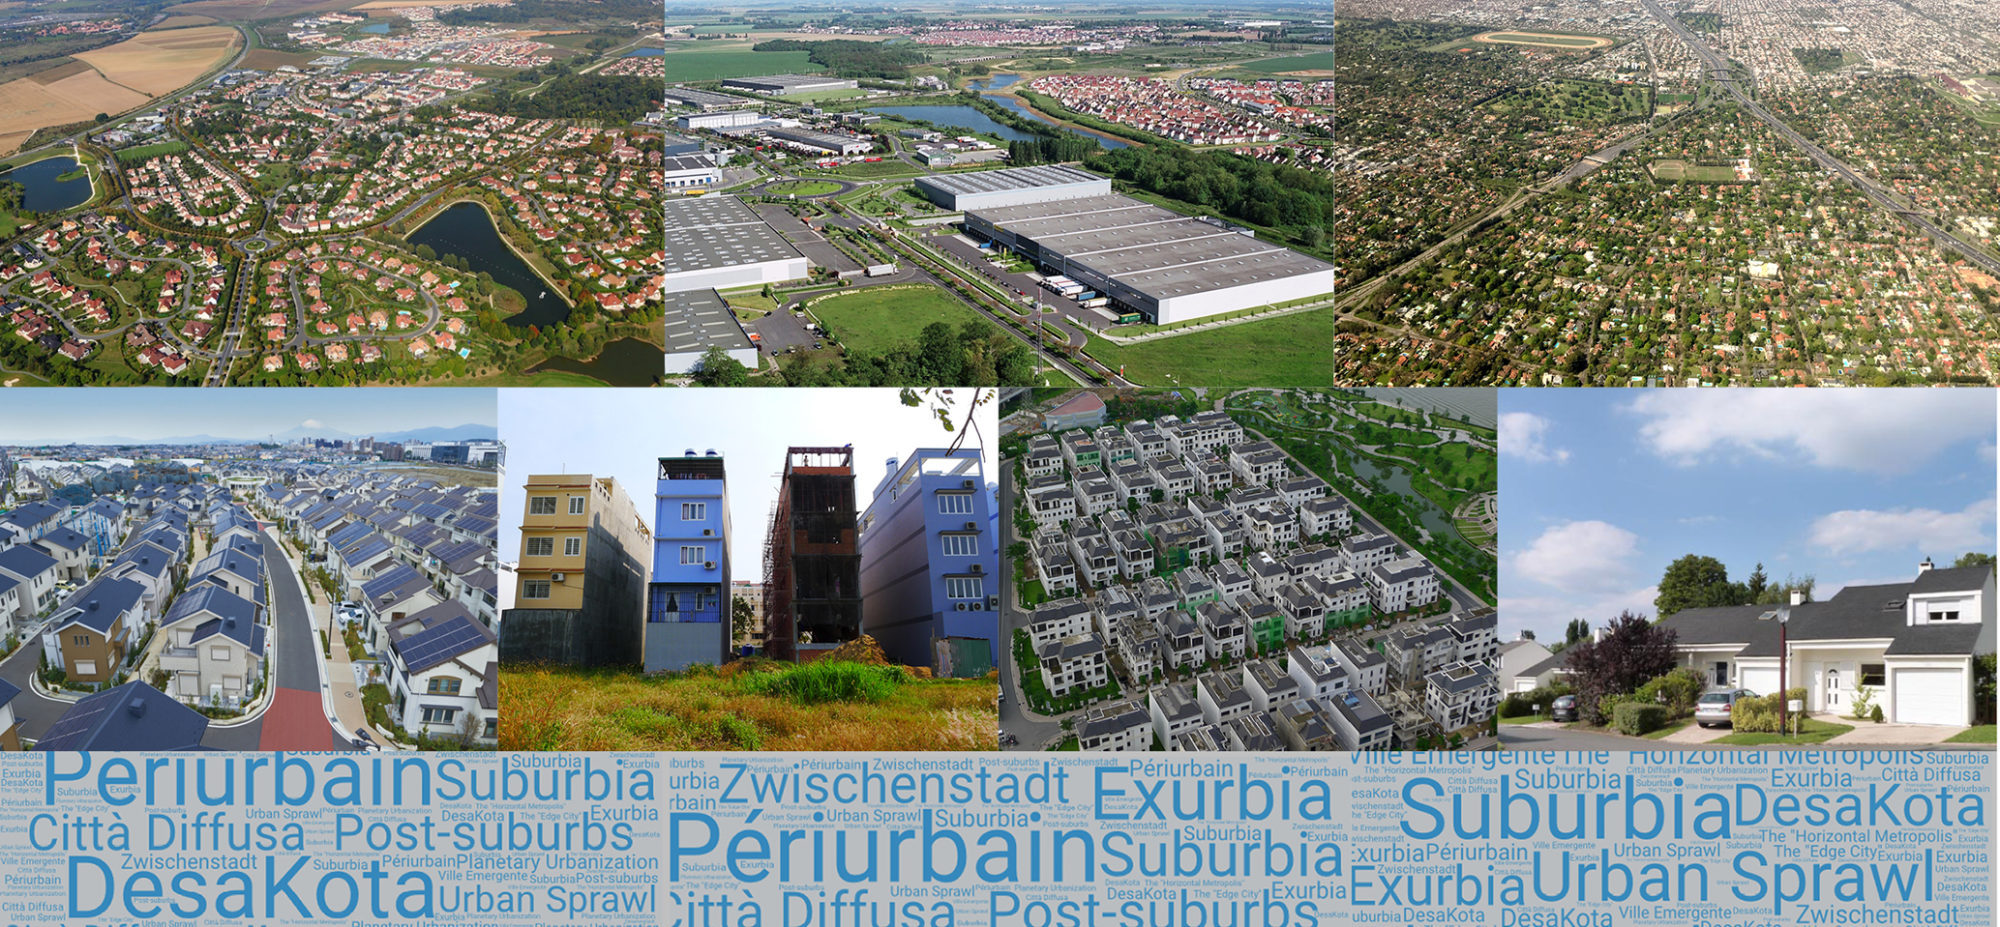 Diffuse Cities & Urbanization Network